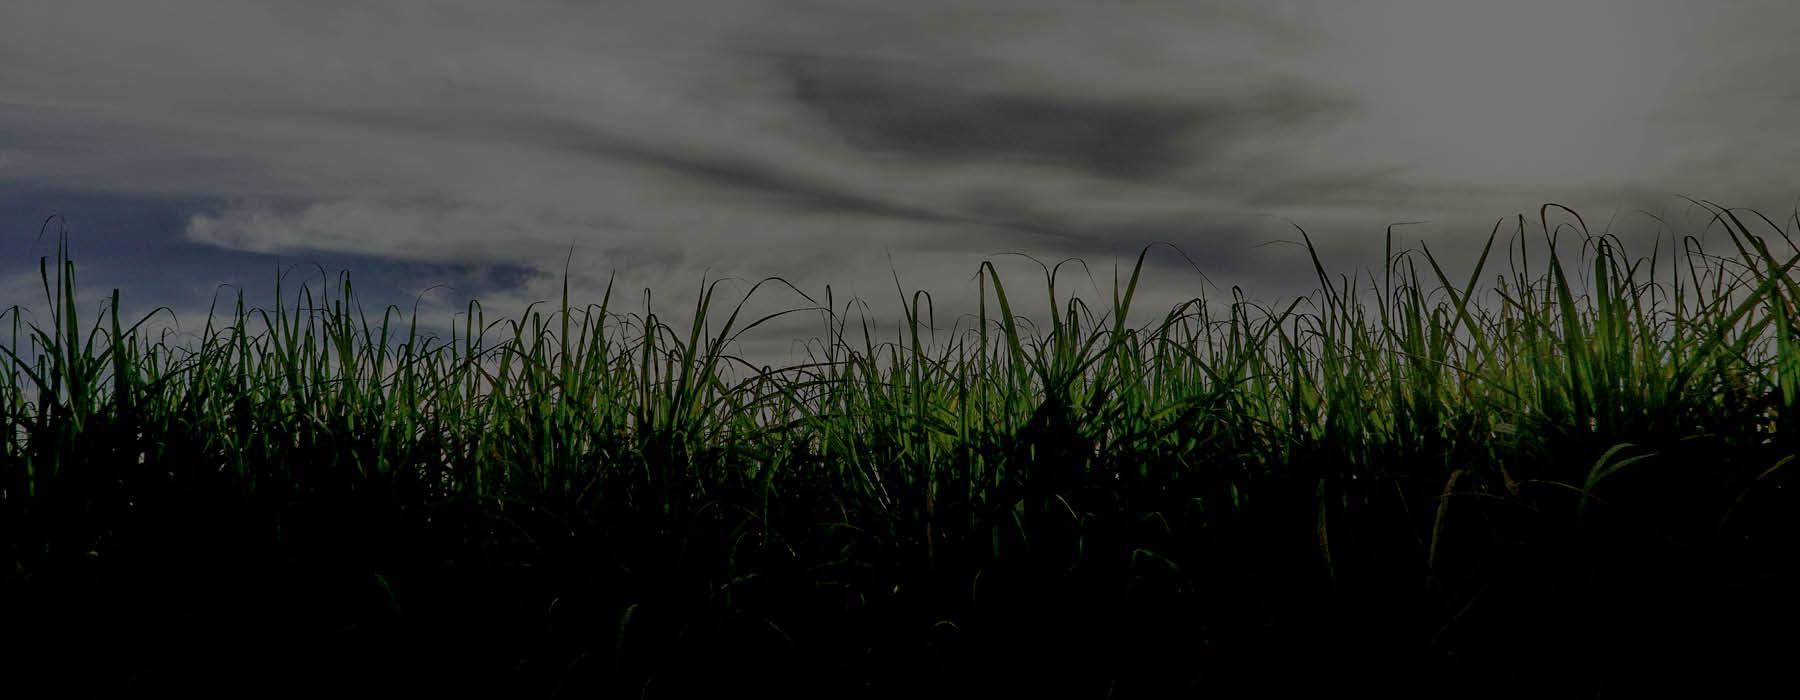 sugarcane header.jpg